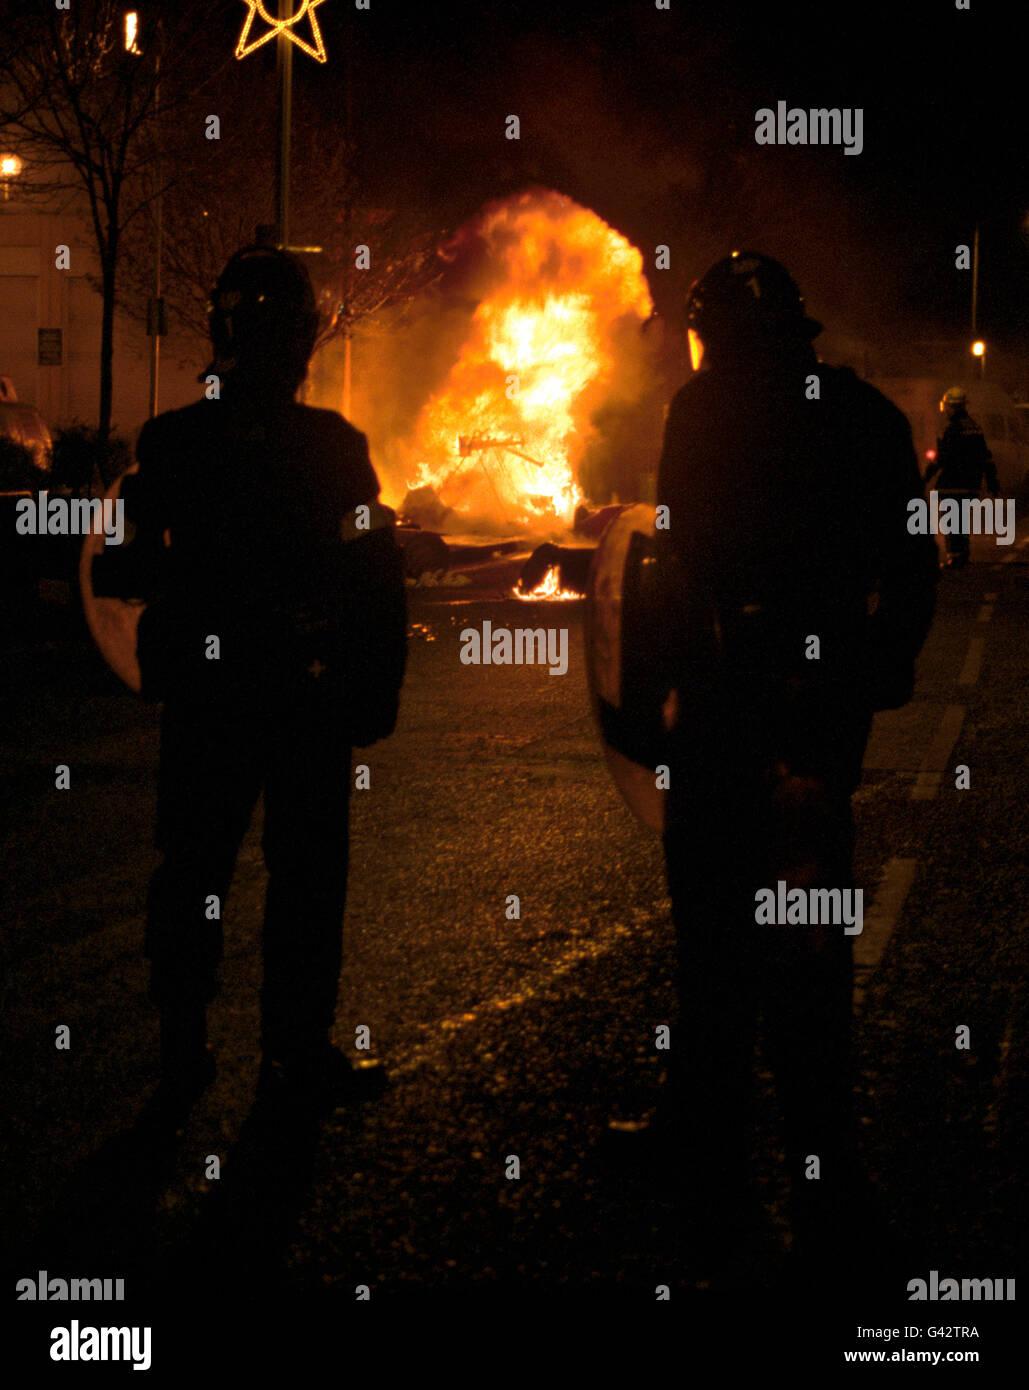 British Crime - Civil Disturbance - Brixton Riots - London - 1995 - Stock Image